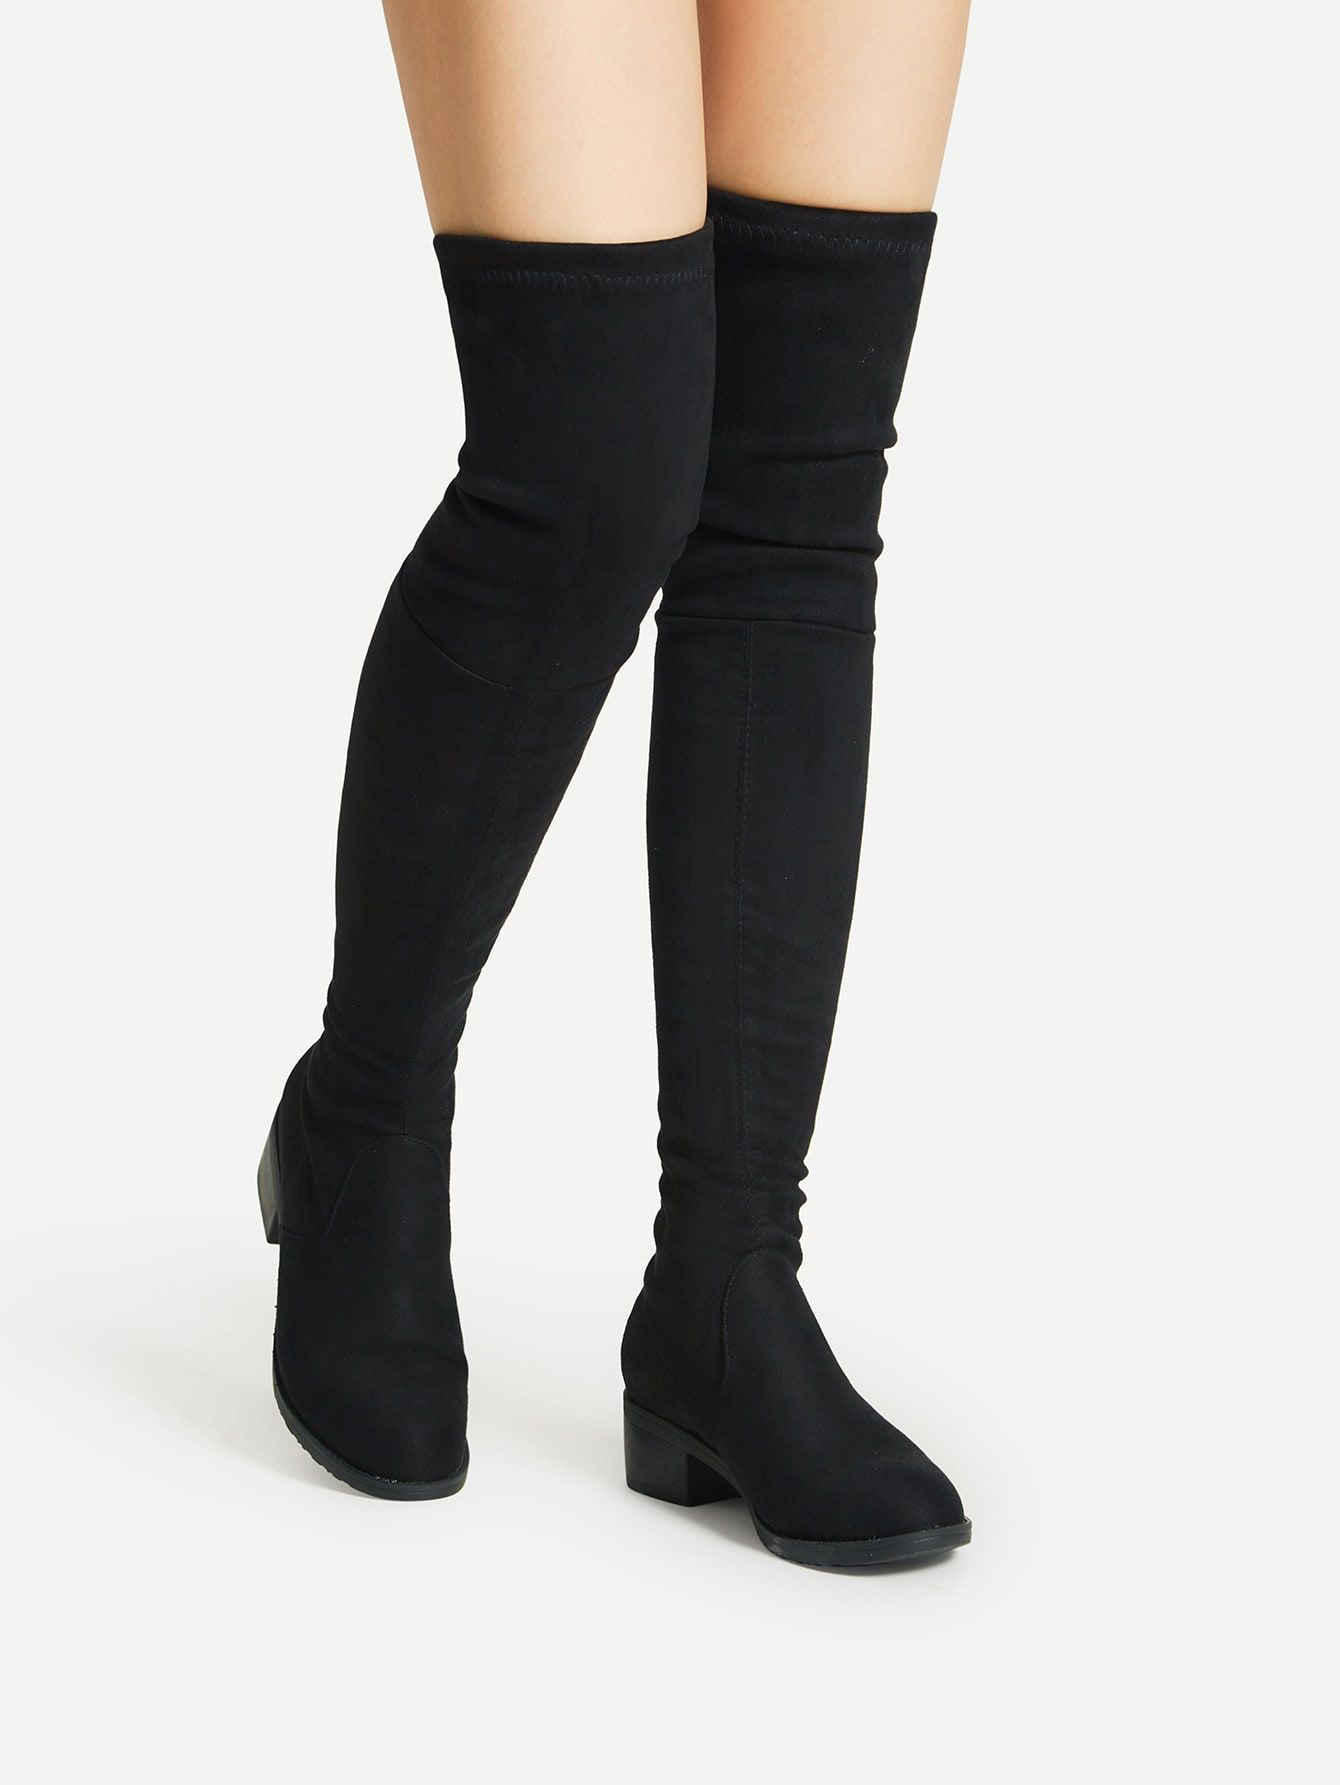 918d19c89f8 Elegant Round Toe OTK/Thigh High No zipper Black Mid Heel Chunky ...